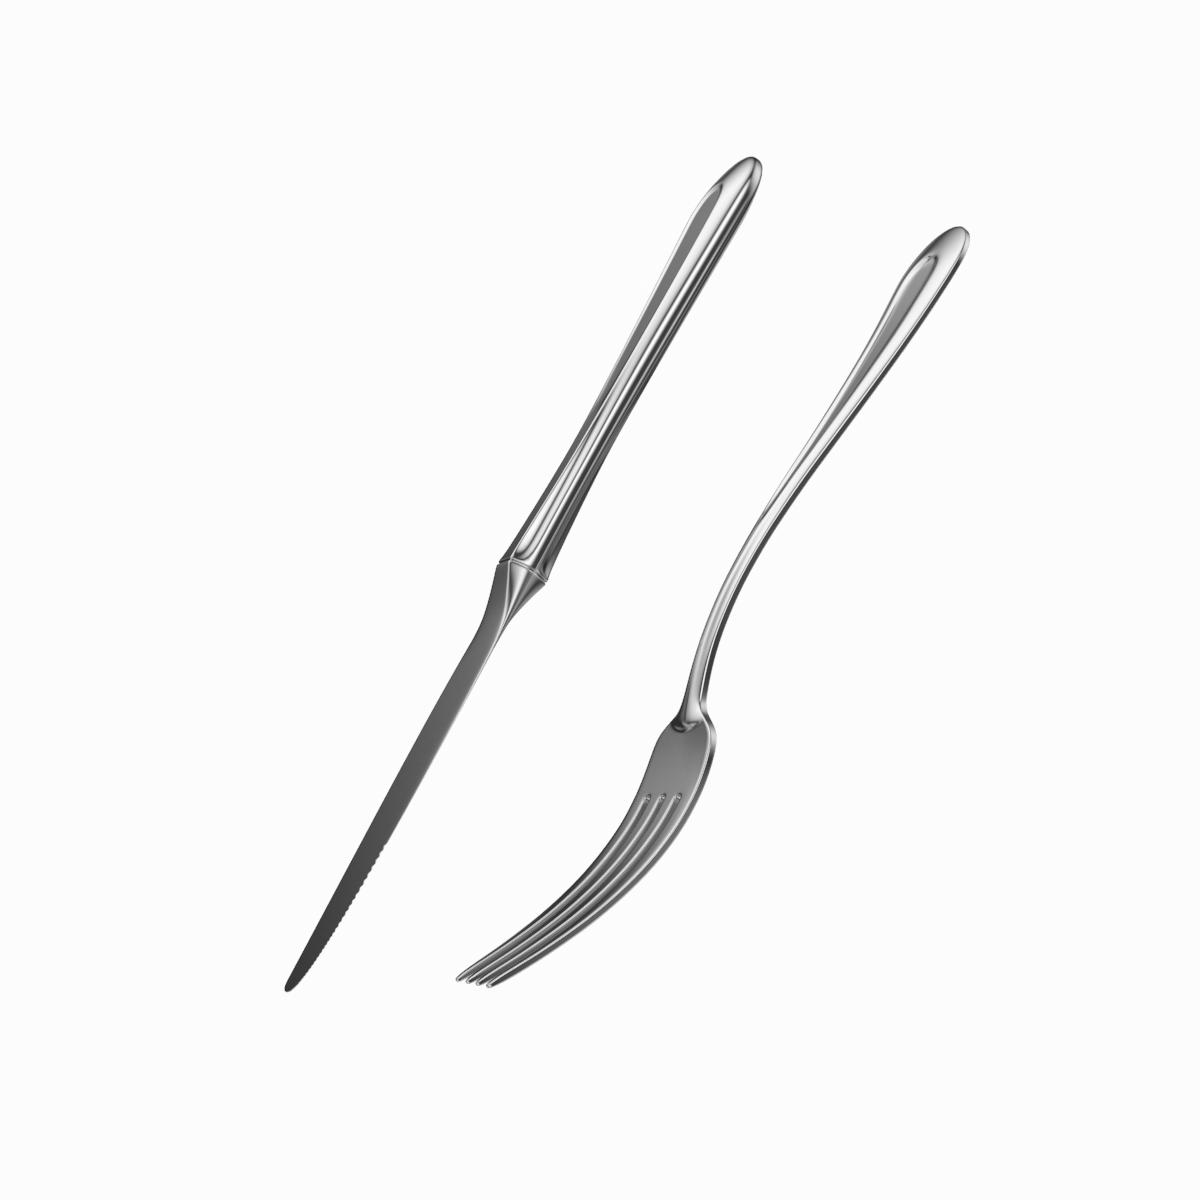 dessert knife and fork classic cutlery 3d model 3ds c4d fbx max max ma mb obj txt png stl 285941